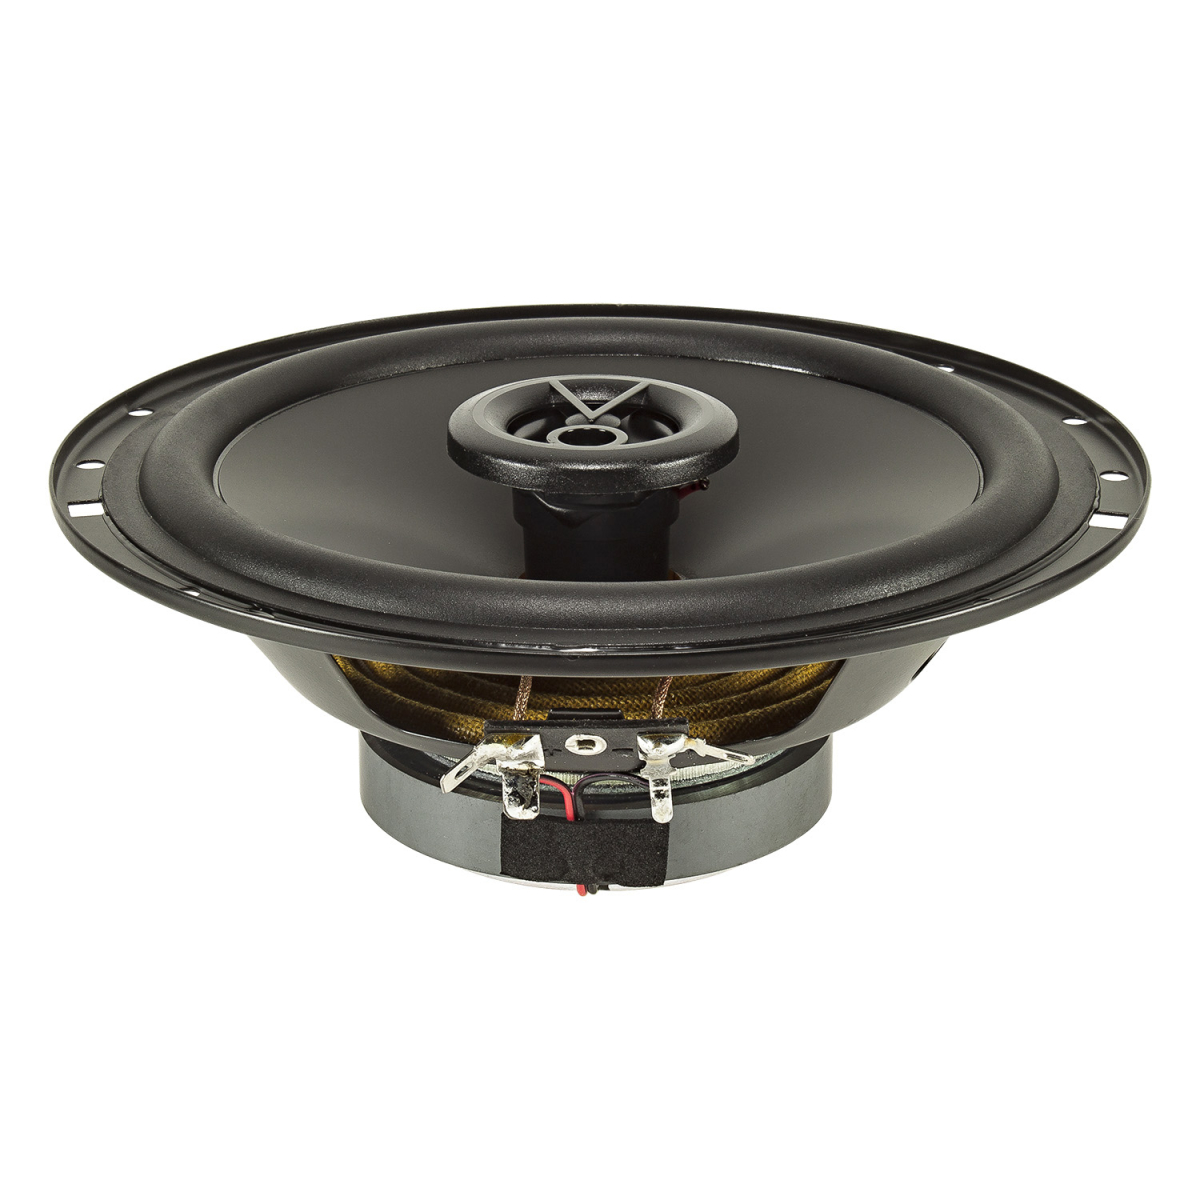 tomzz Audio 4039-006 Lautsprecher Einbau-Set f/ür Opel Astra H Corsa D Corsa E 165mm Koaxial System TA16.5-Pro